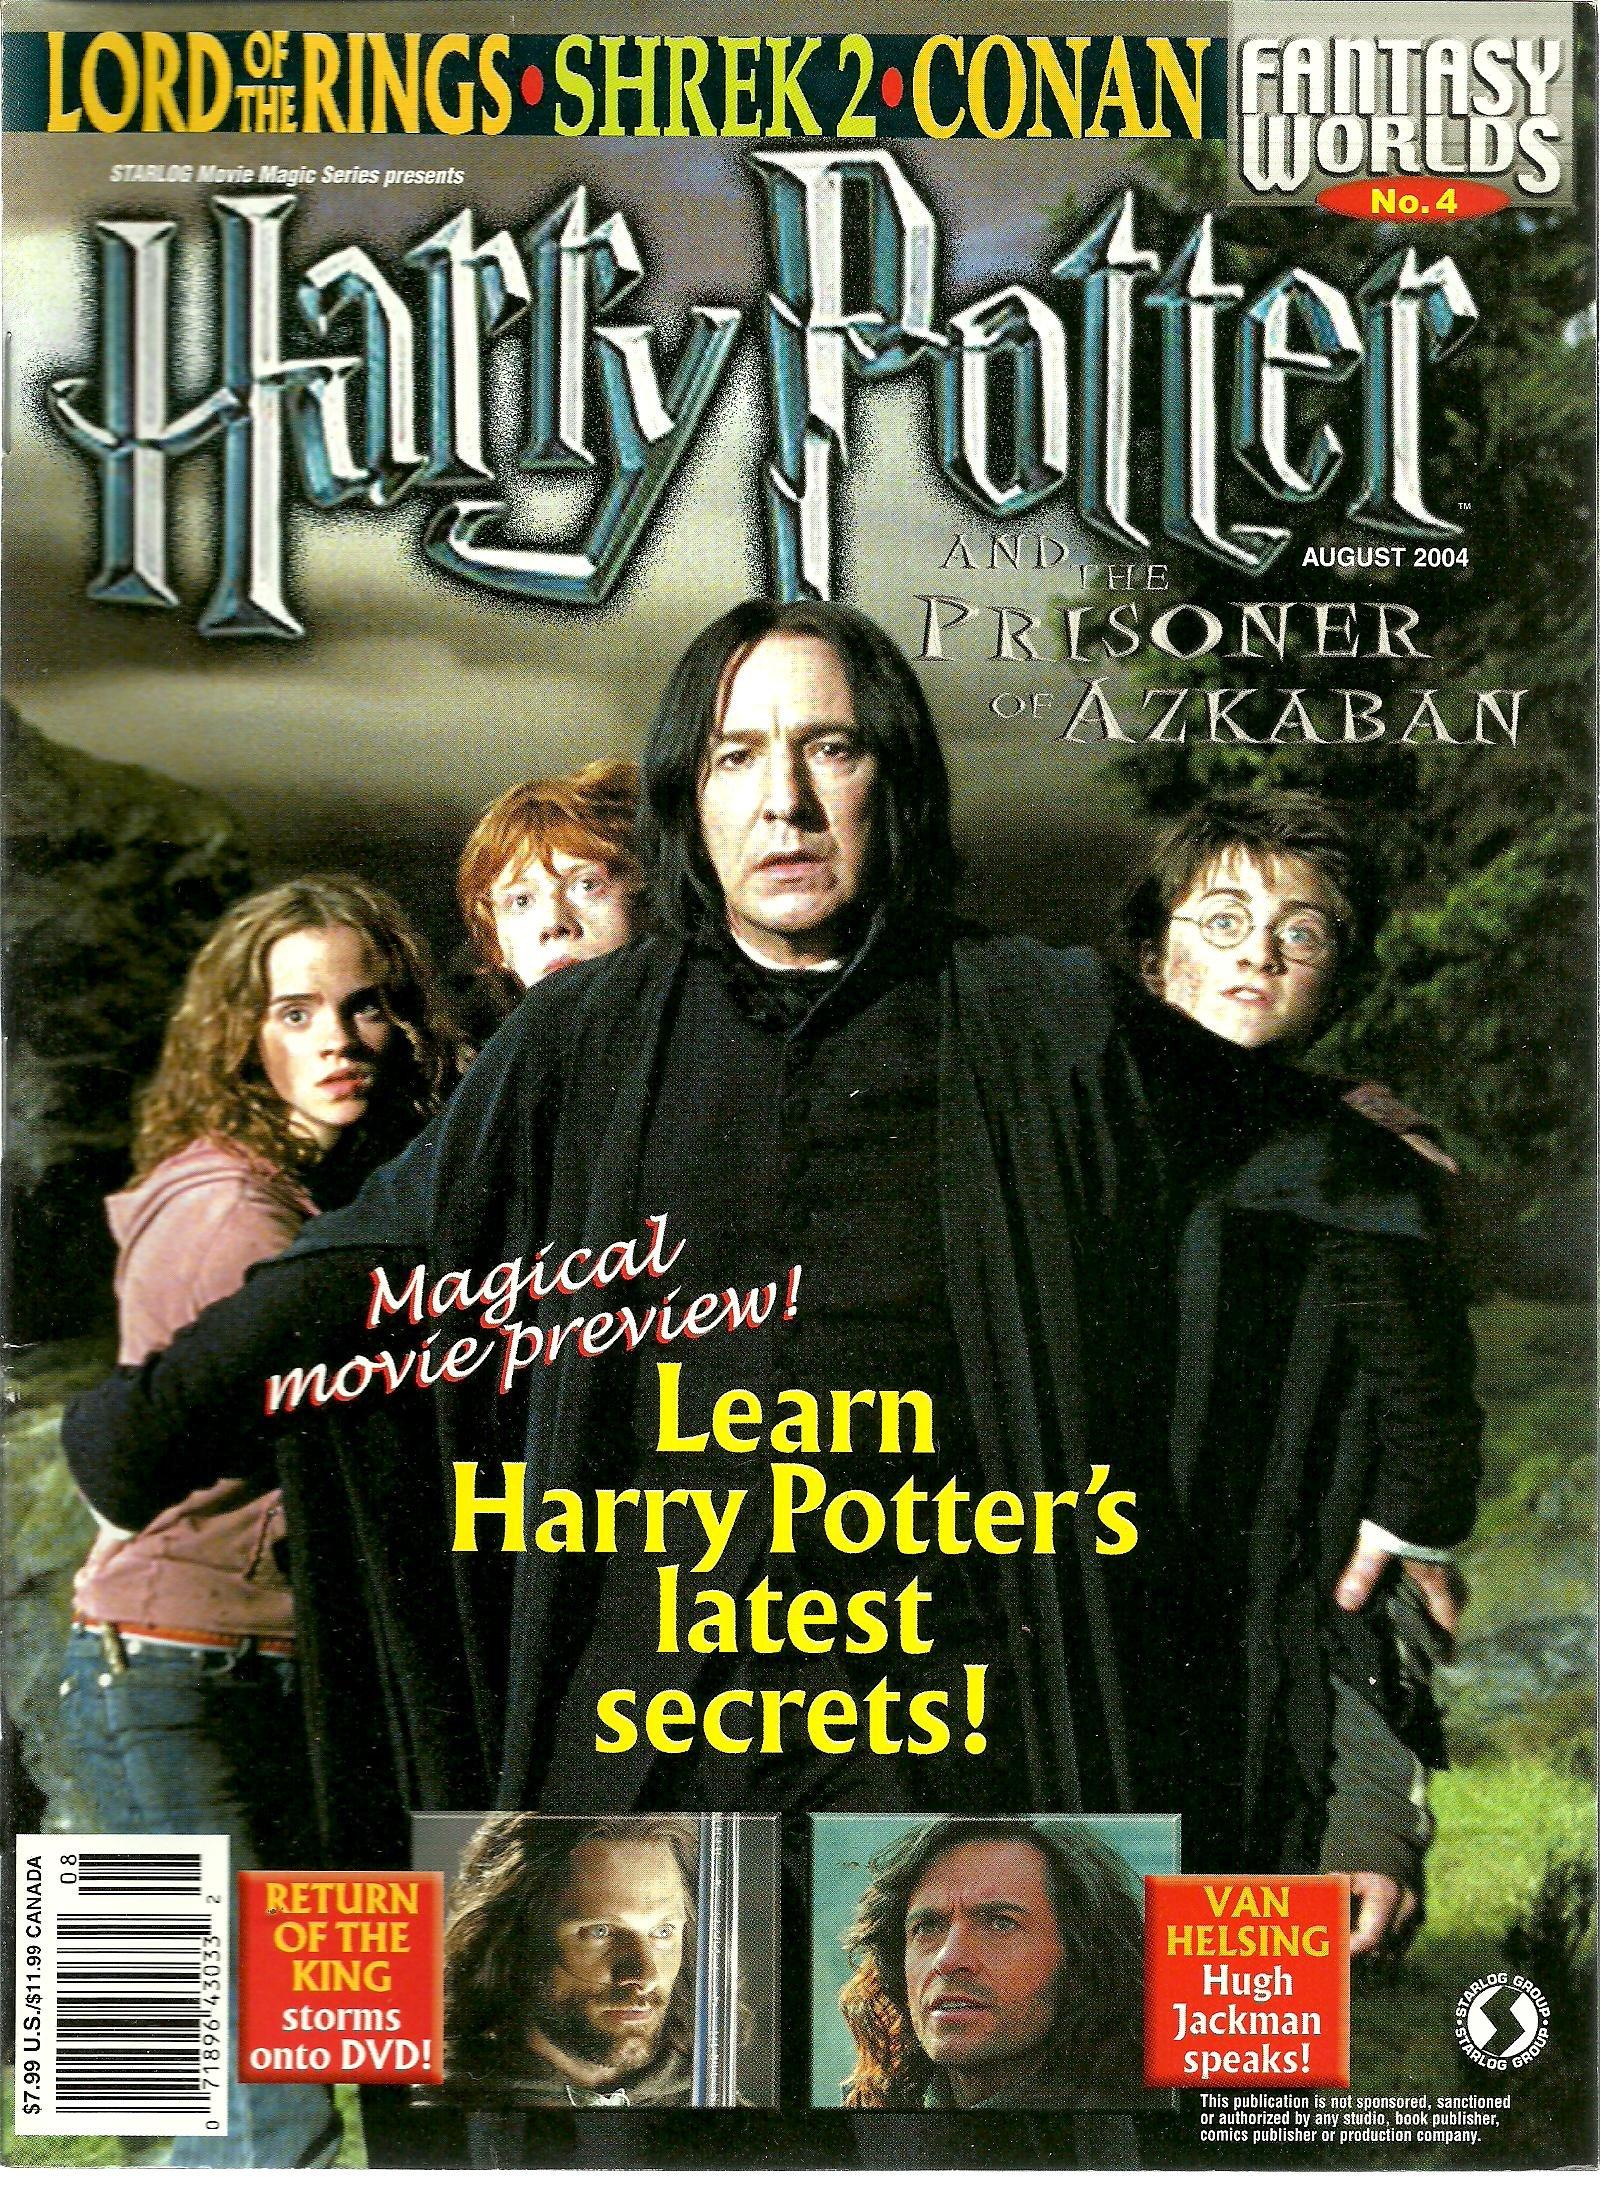 Fantasy Worlds Magazine - Harry Potter and the Prisoner of Azkaban, Lord of the Rings, Shrek 2, Conan, Hugh Jackman, Harry Potter's Latest Secrets (August, 2004, Noo. 4)